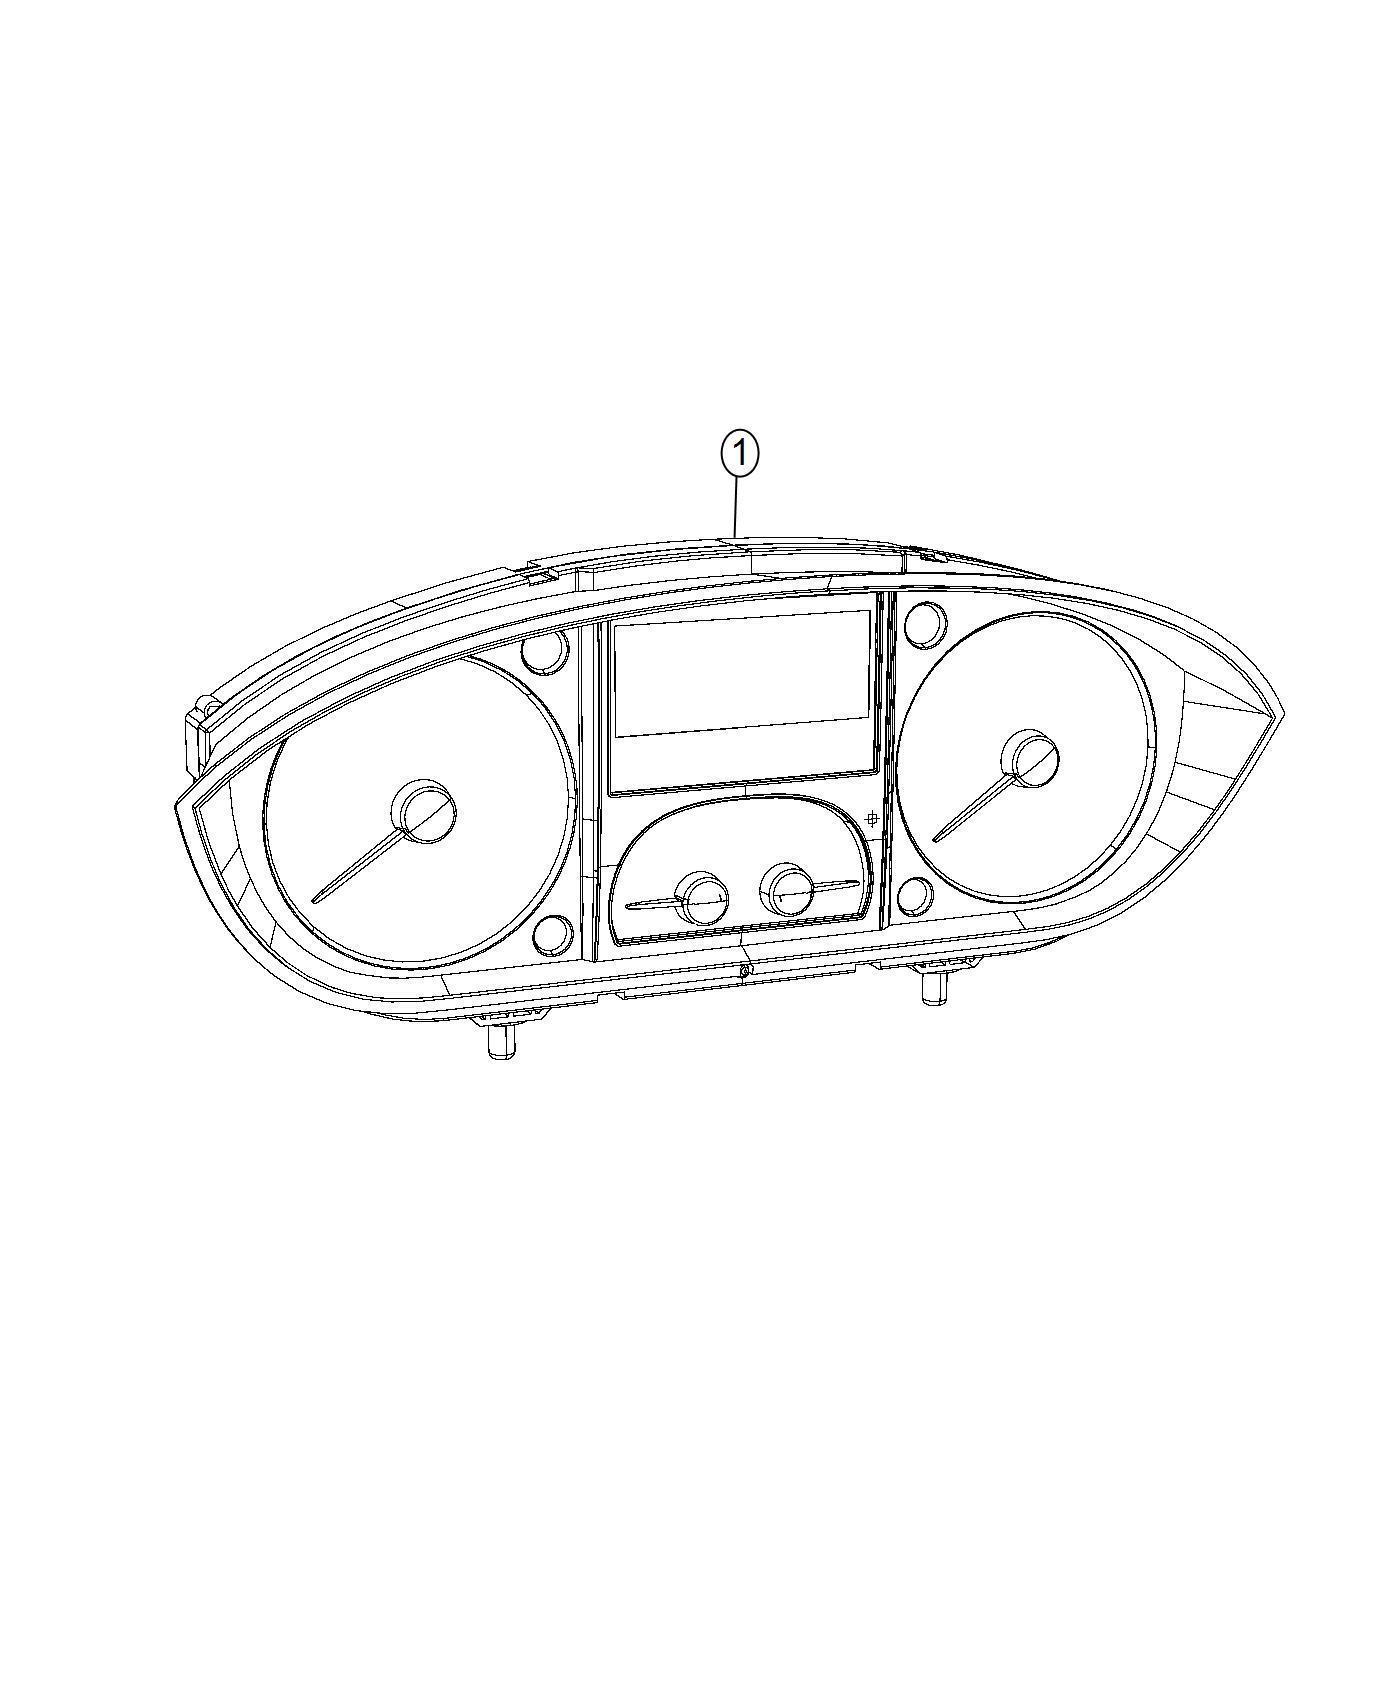 2016 Dodge Ram 2500 Cluster  Canada  Instrument Panel